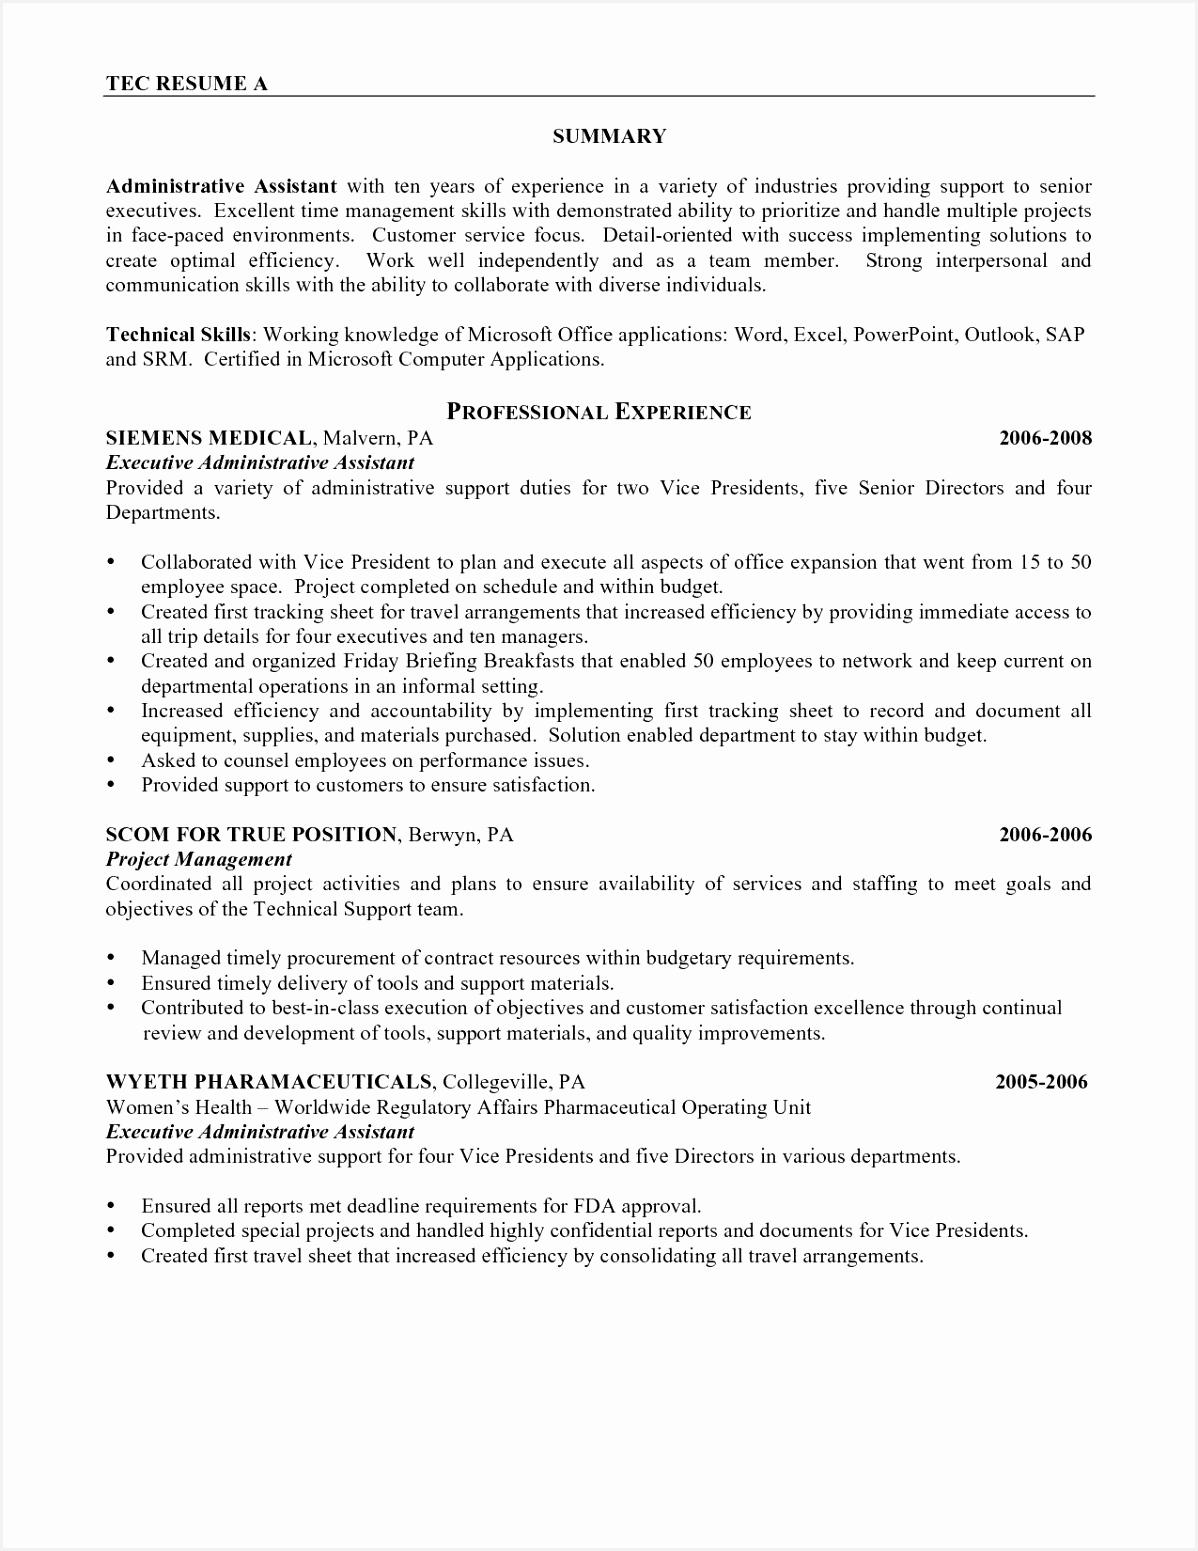 Resume Sample Executive Director Valid Best Resume Samples New Resume Examples Pdf Best Resume Pdf 0d Voir 15511198eEikd